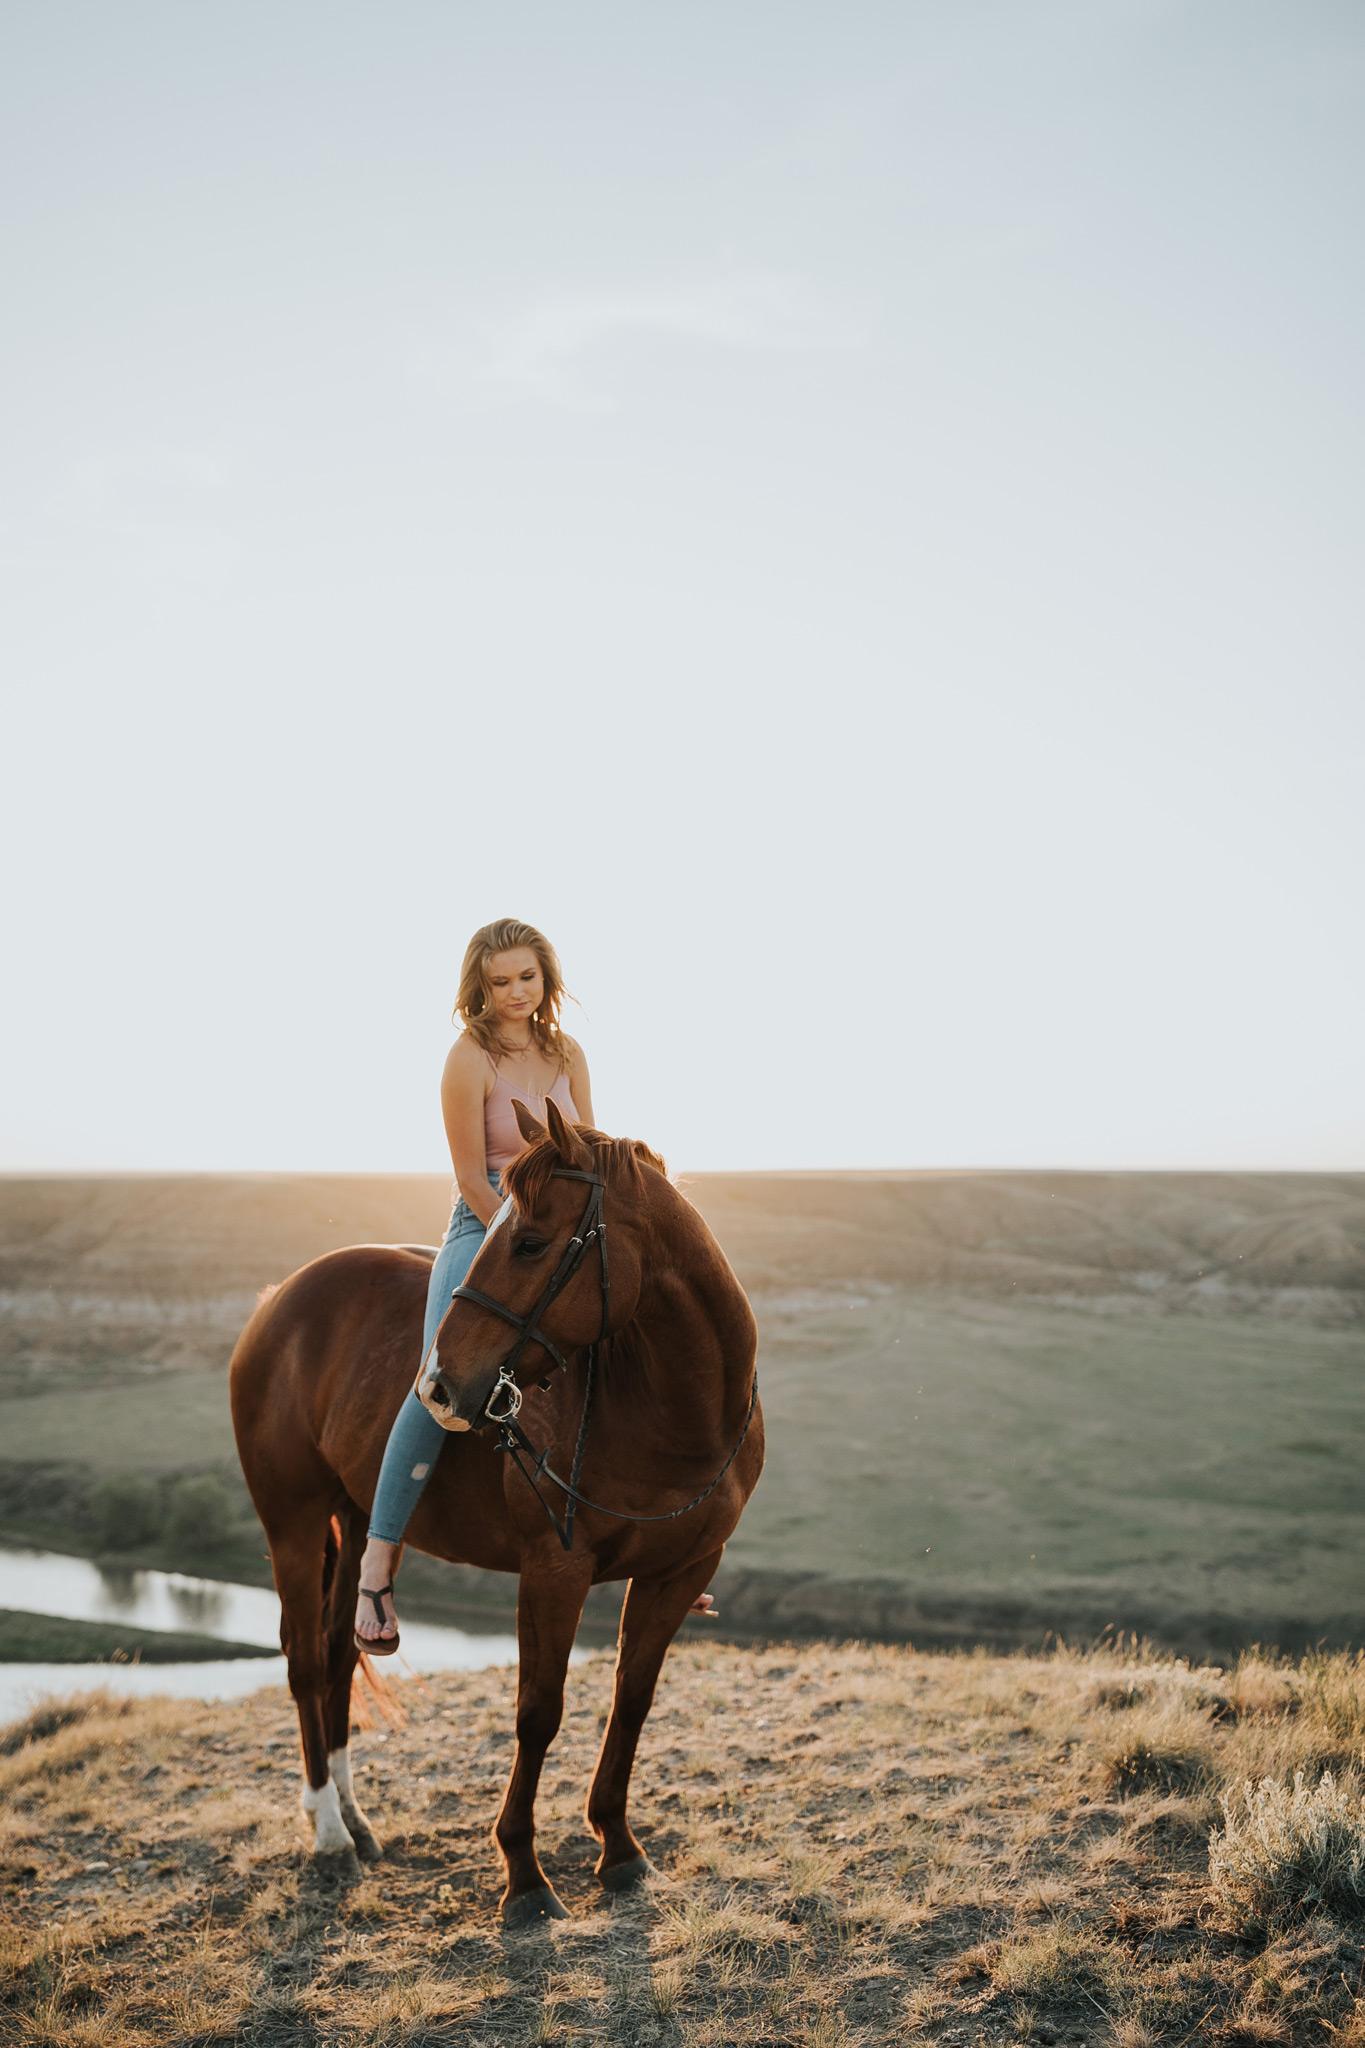 equine senior photo girl sitting on horse alberta coulee sunset